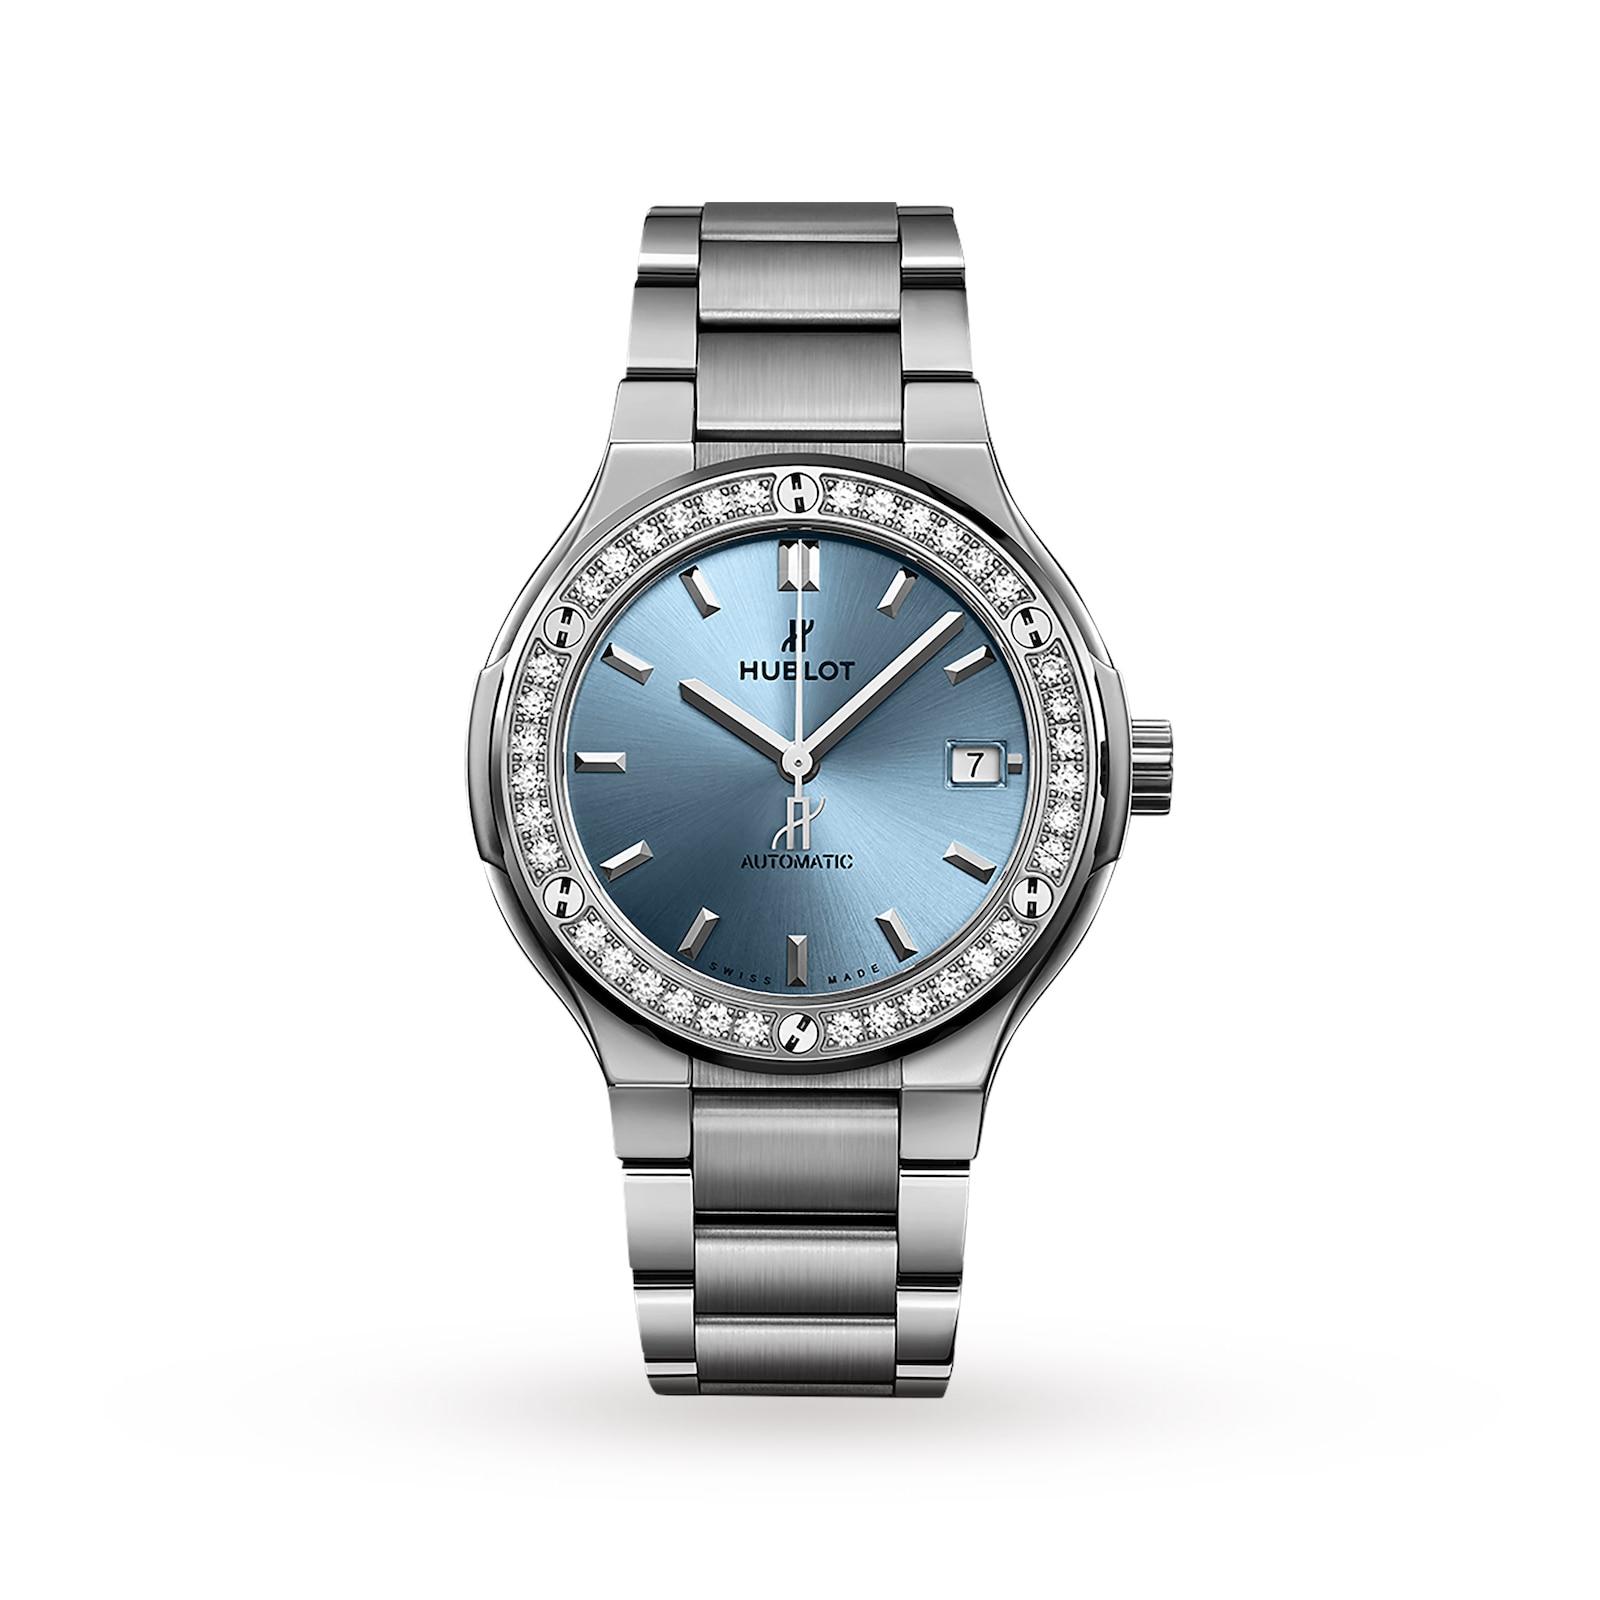 Hublot Hublot Classic Fusion Titanium Light Blue 38mm Ladies Watch